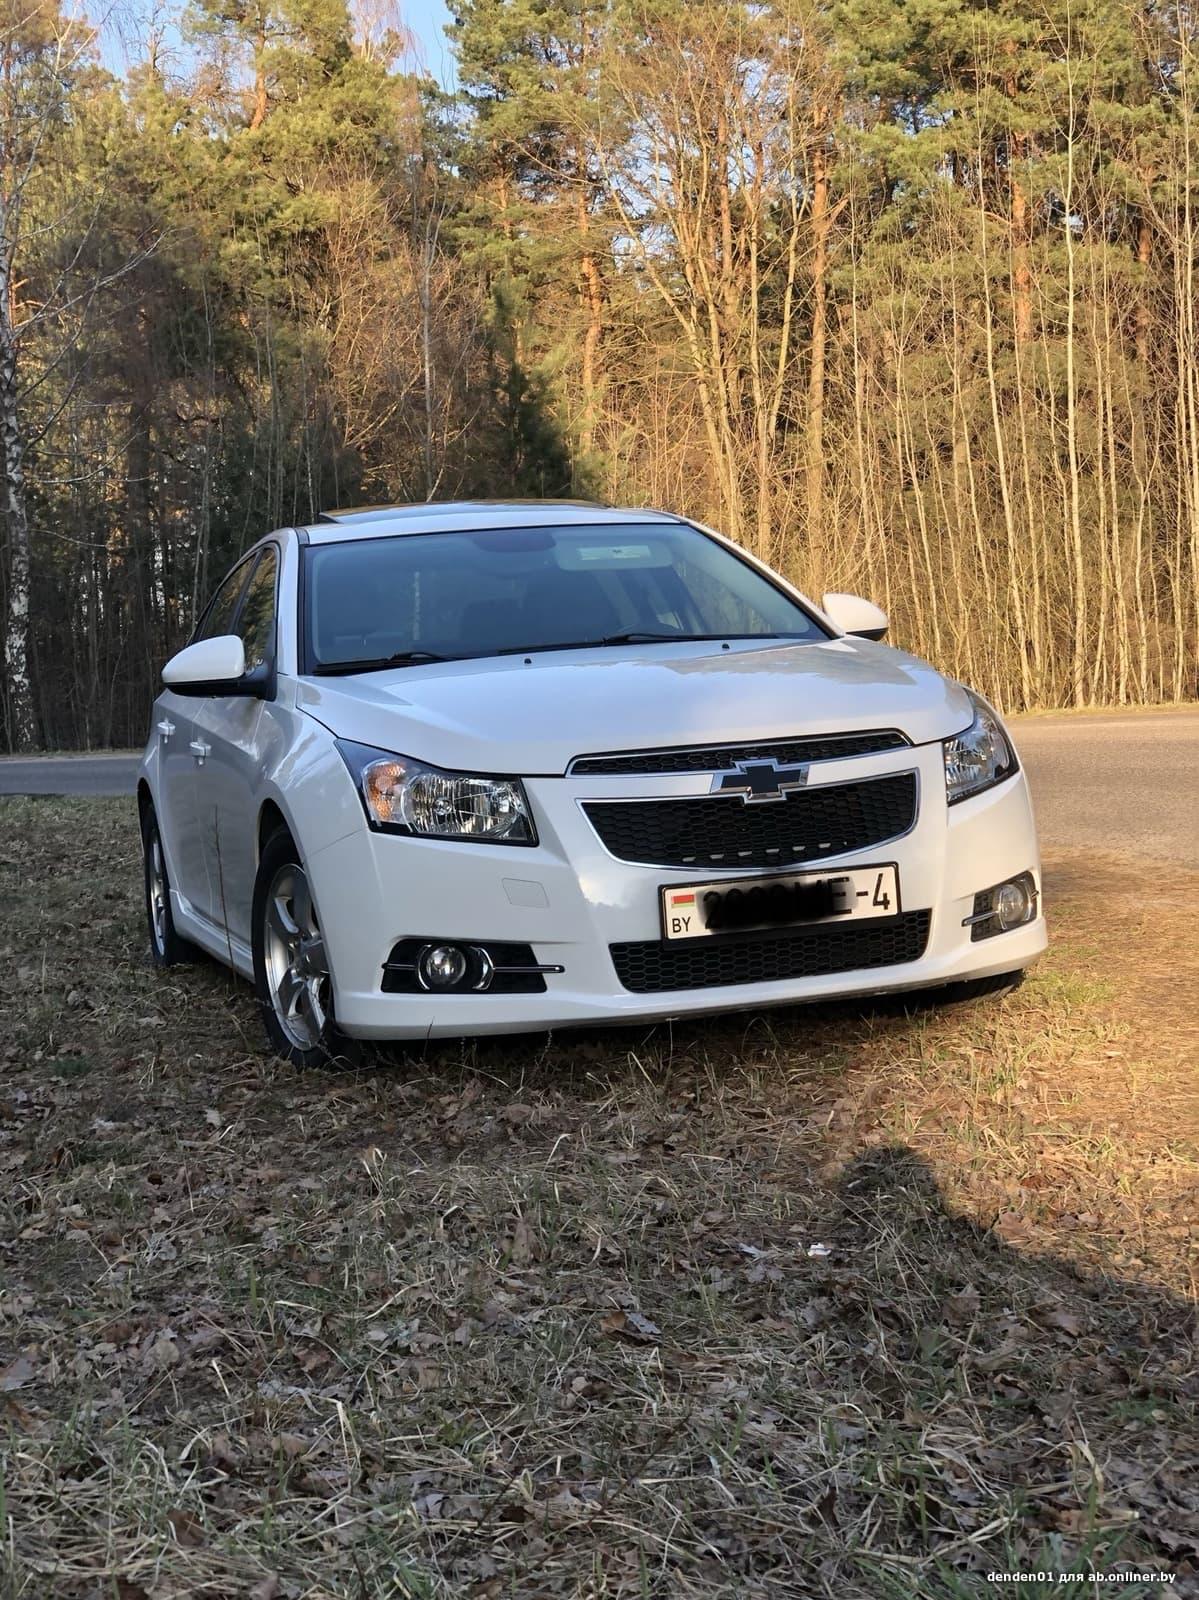 Chevrolet Cruze RS LT